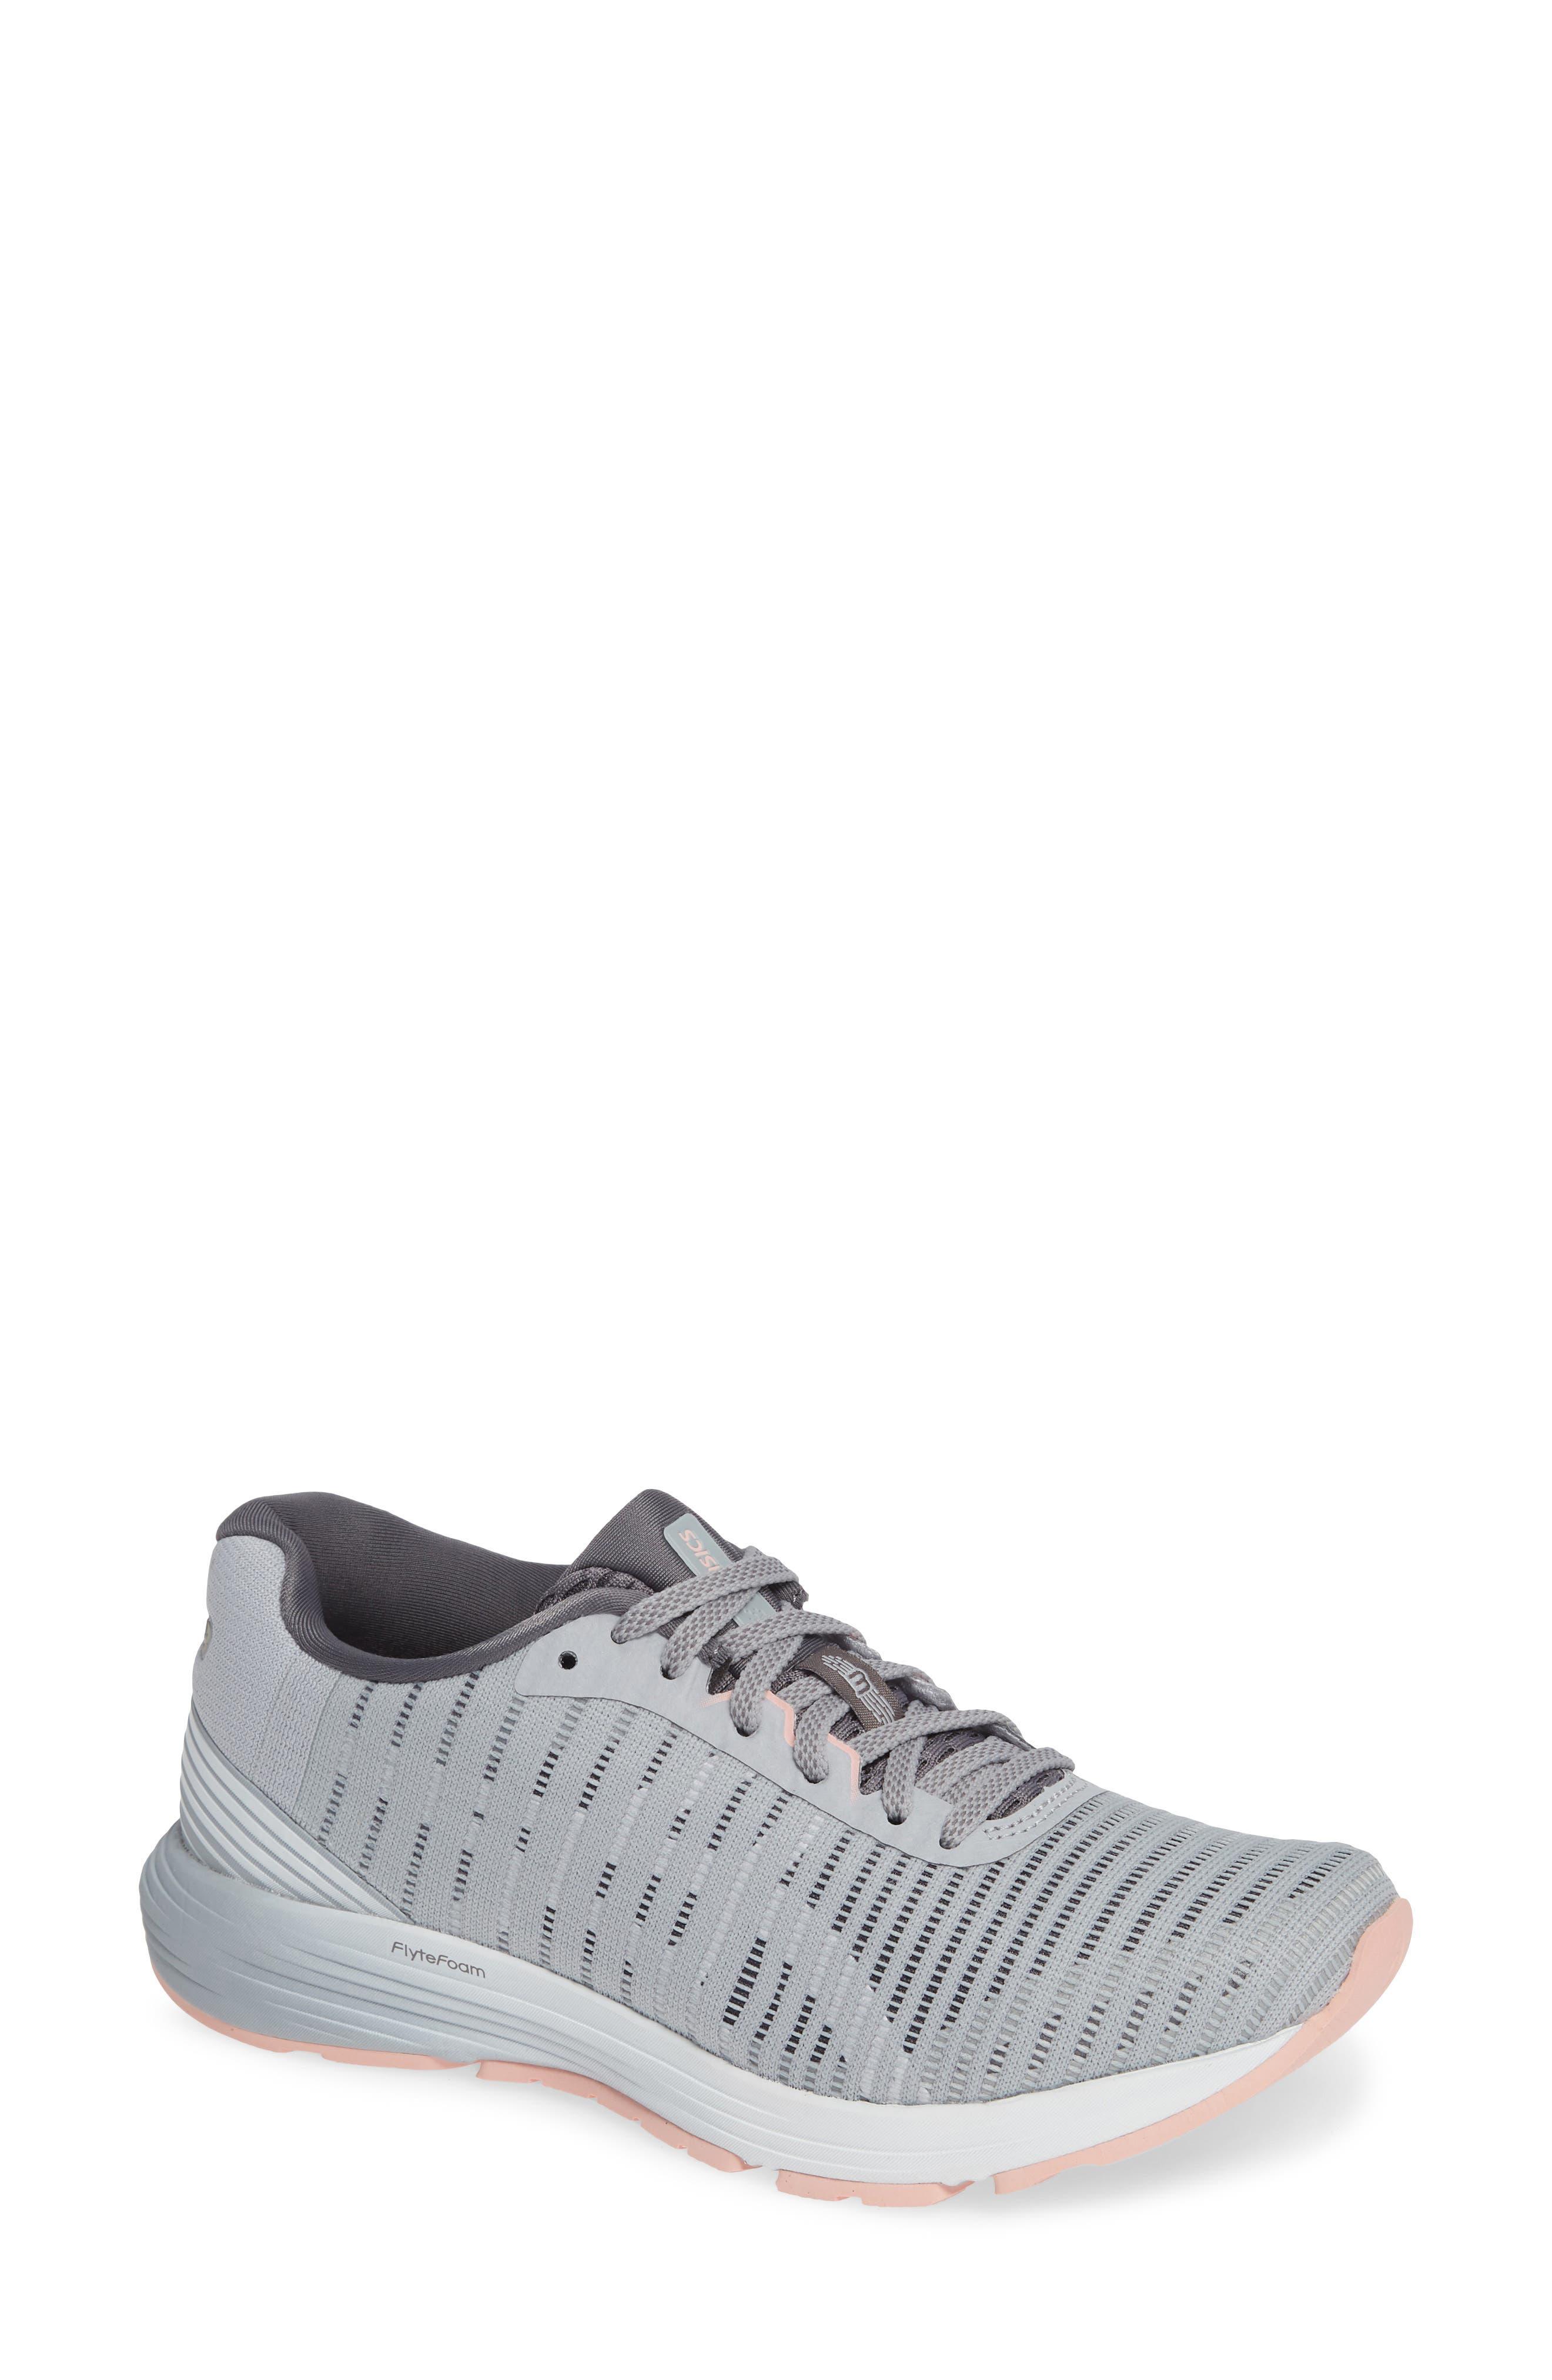 Asics Dynaflyte 3 Running Shoe, Grey